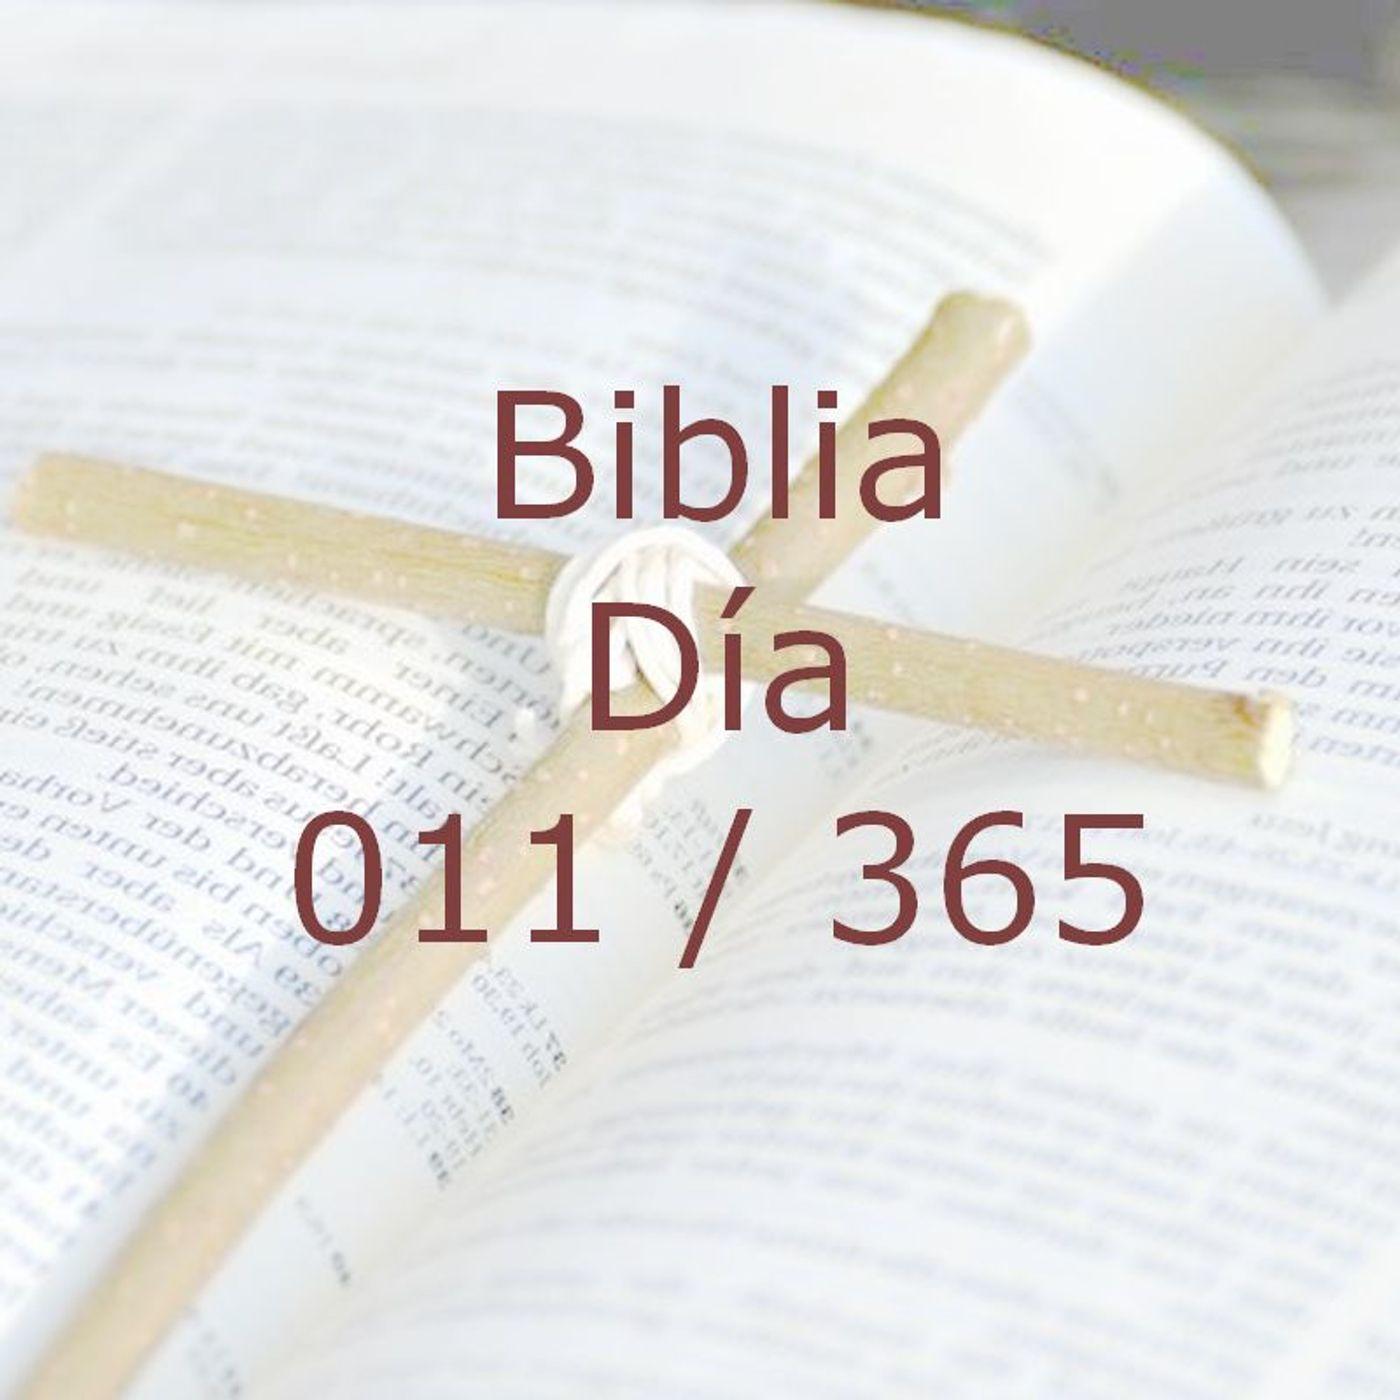 365 dias para la Biblia - Dia 011